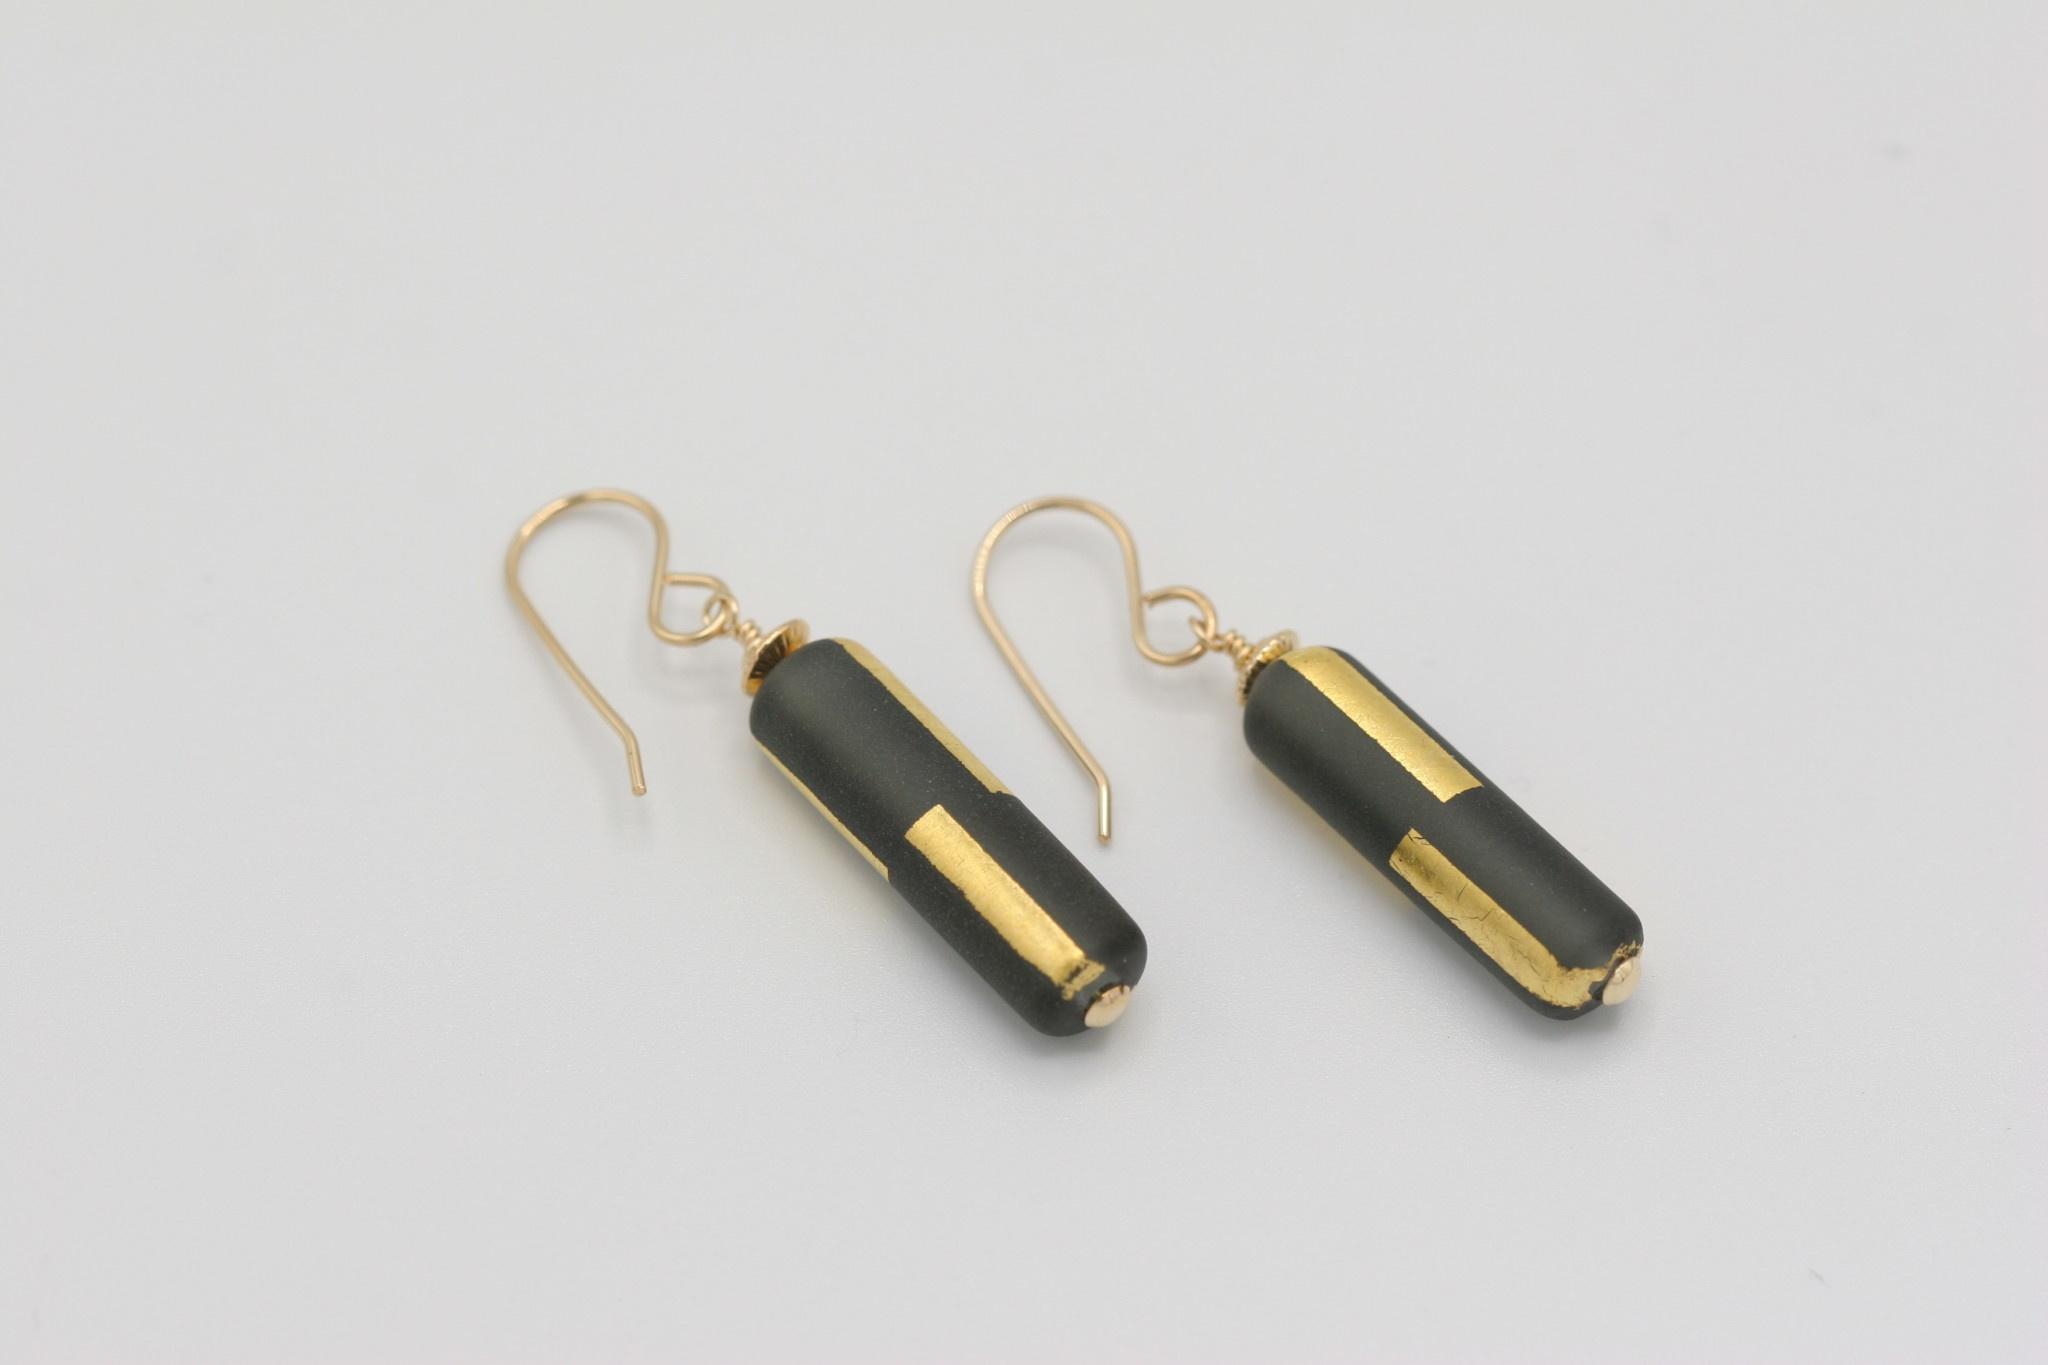 Minori Takagi Earrings - Gold Line